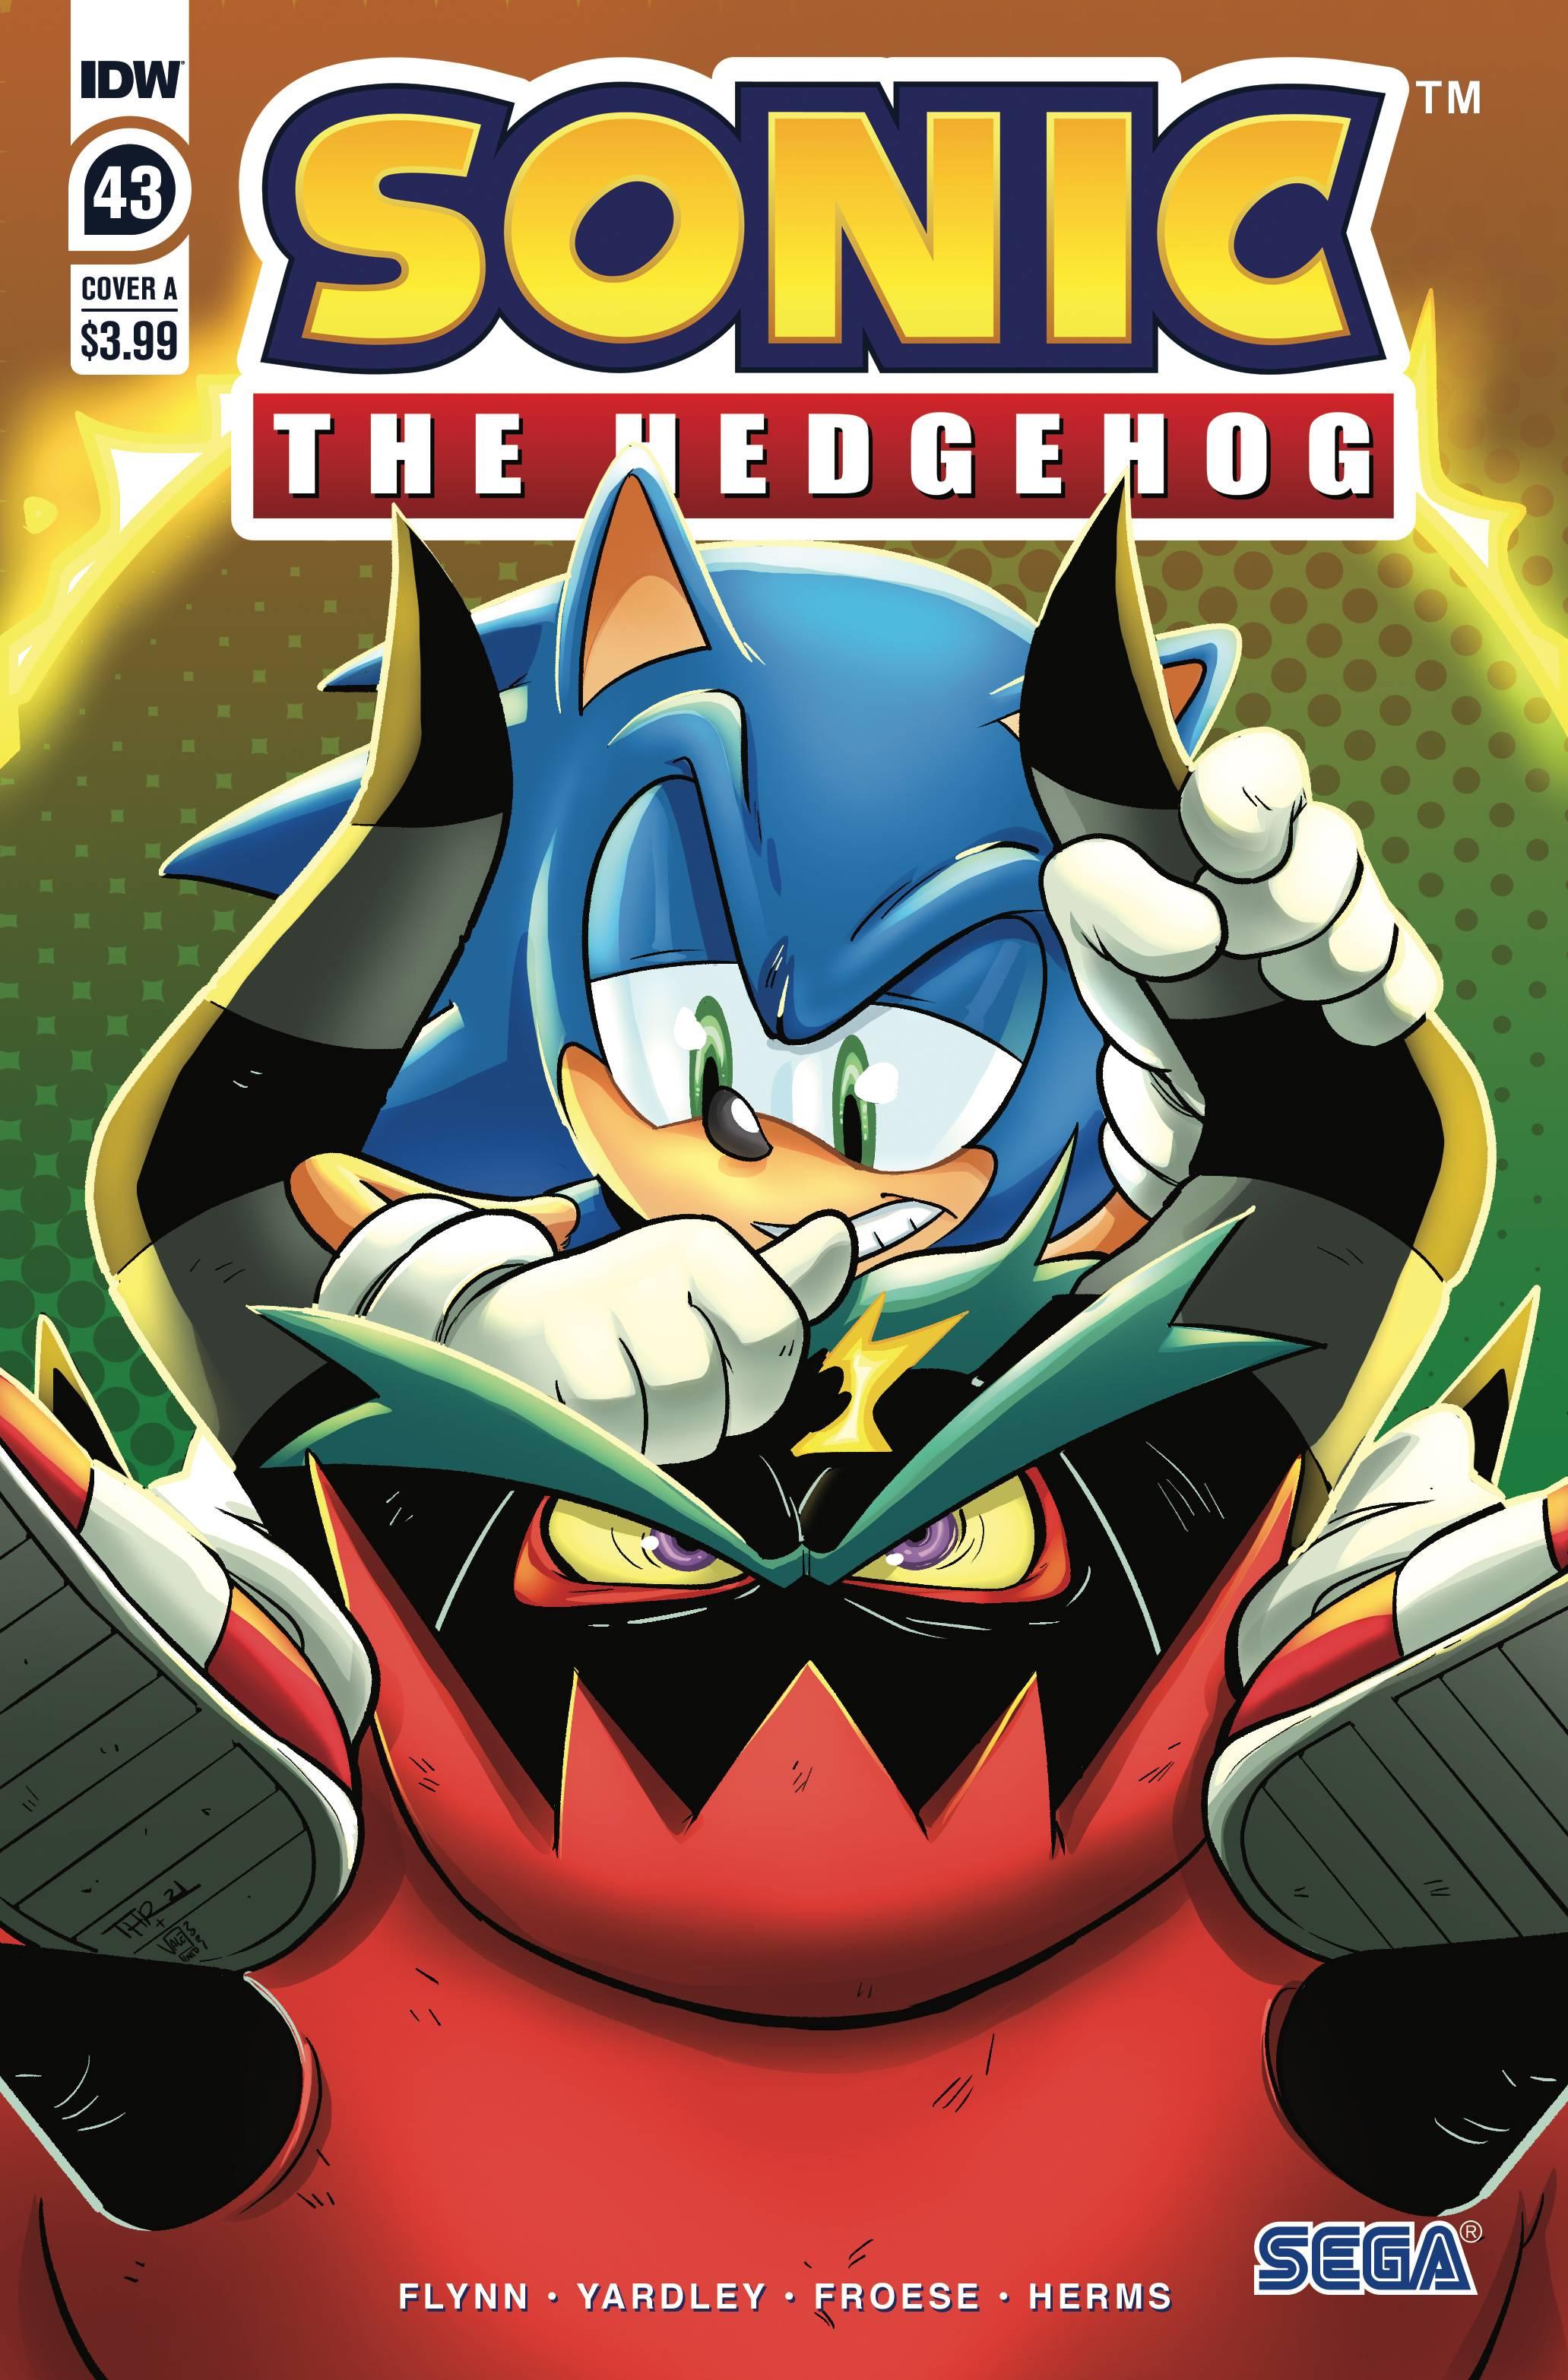 IDW Sonic the Hedgehog - przegląd numeru 43-ego